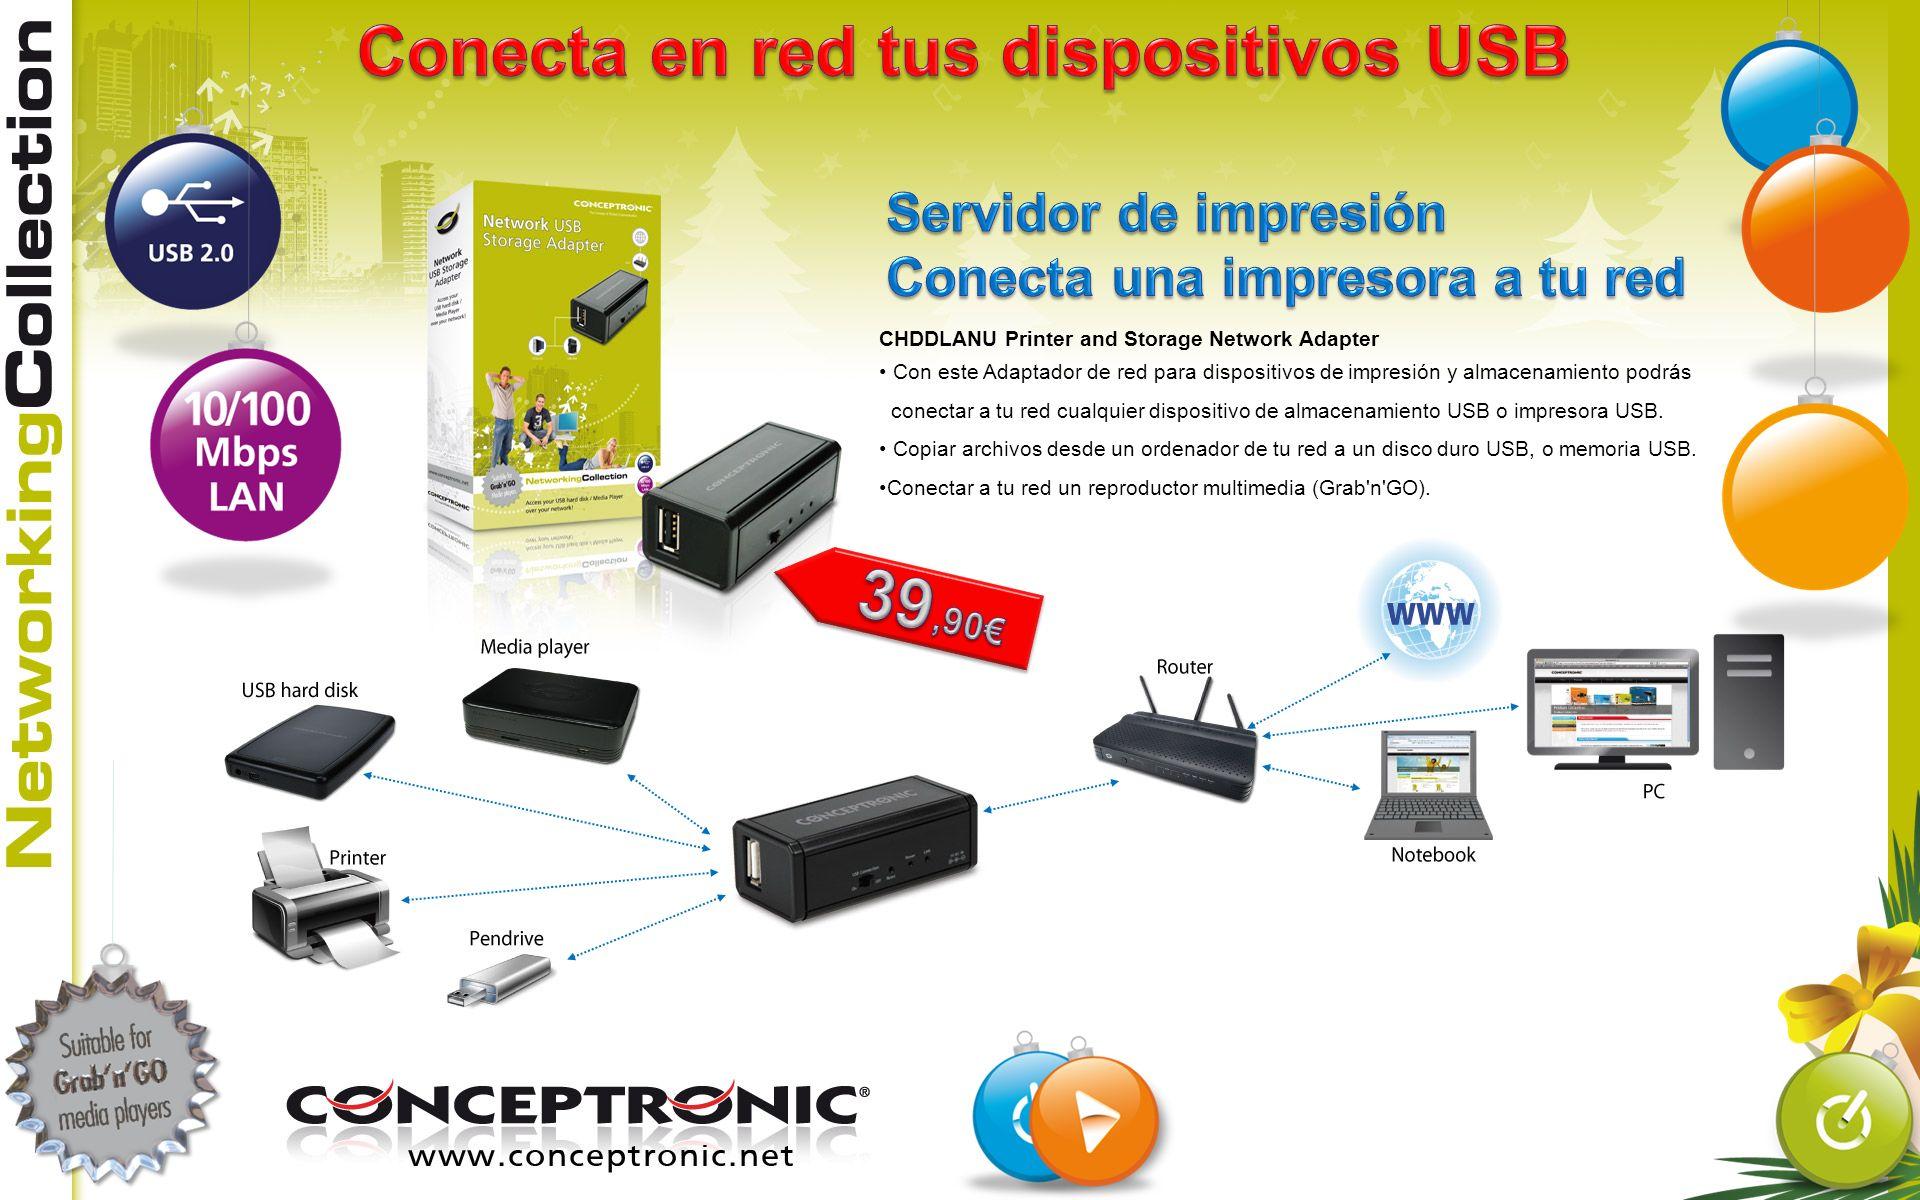 C150RUSM 150N USB Mini Wireless Adapter C150RUS 150N USB Wireless Adapter C150APM 150N Wireless AP/Bridge/Repeater C150APRA2 150N Wireless ADSL Modem and Router